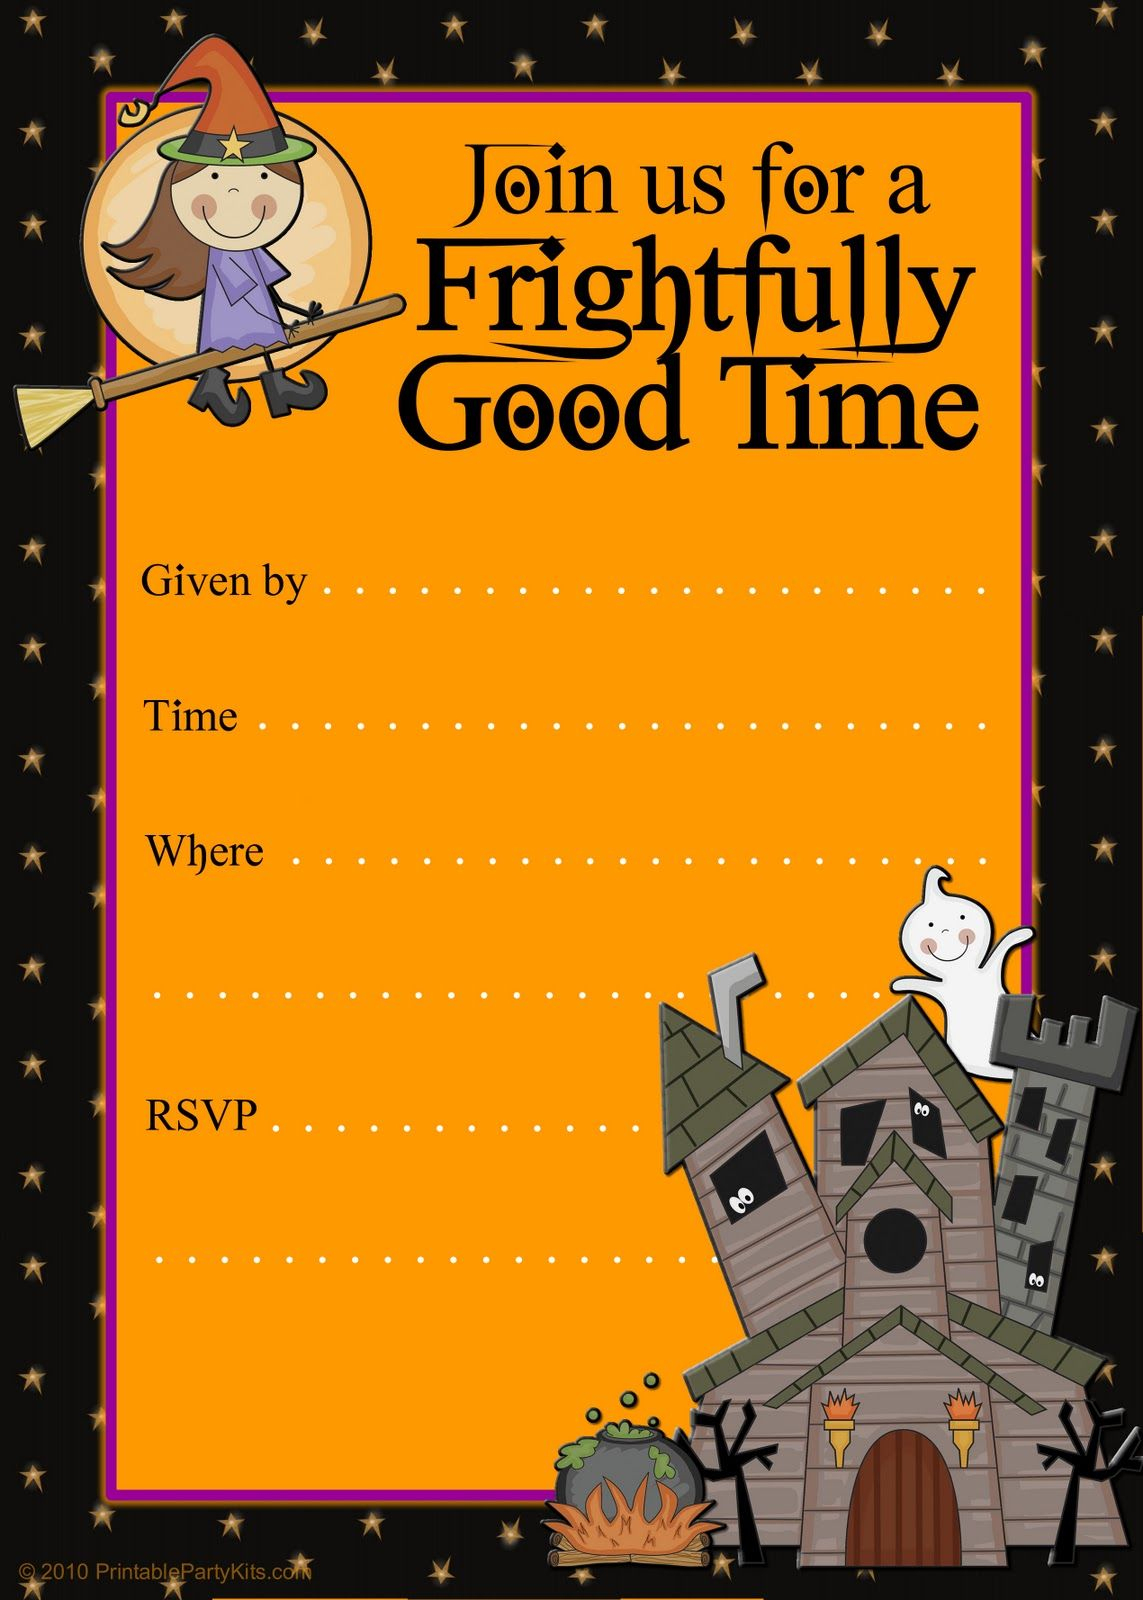 Free Halloween Flyer Invitations Printable | Food | Pinterest - Free Printable Birthday Party Flyers